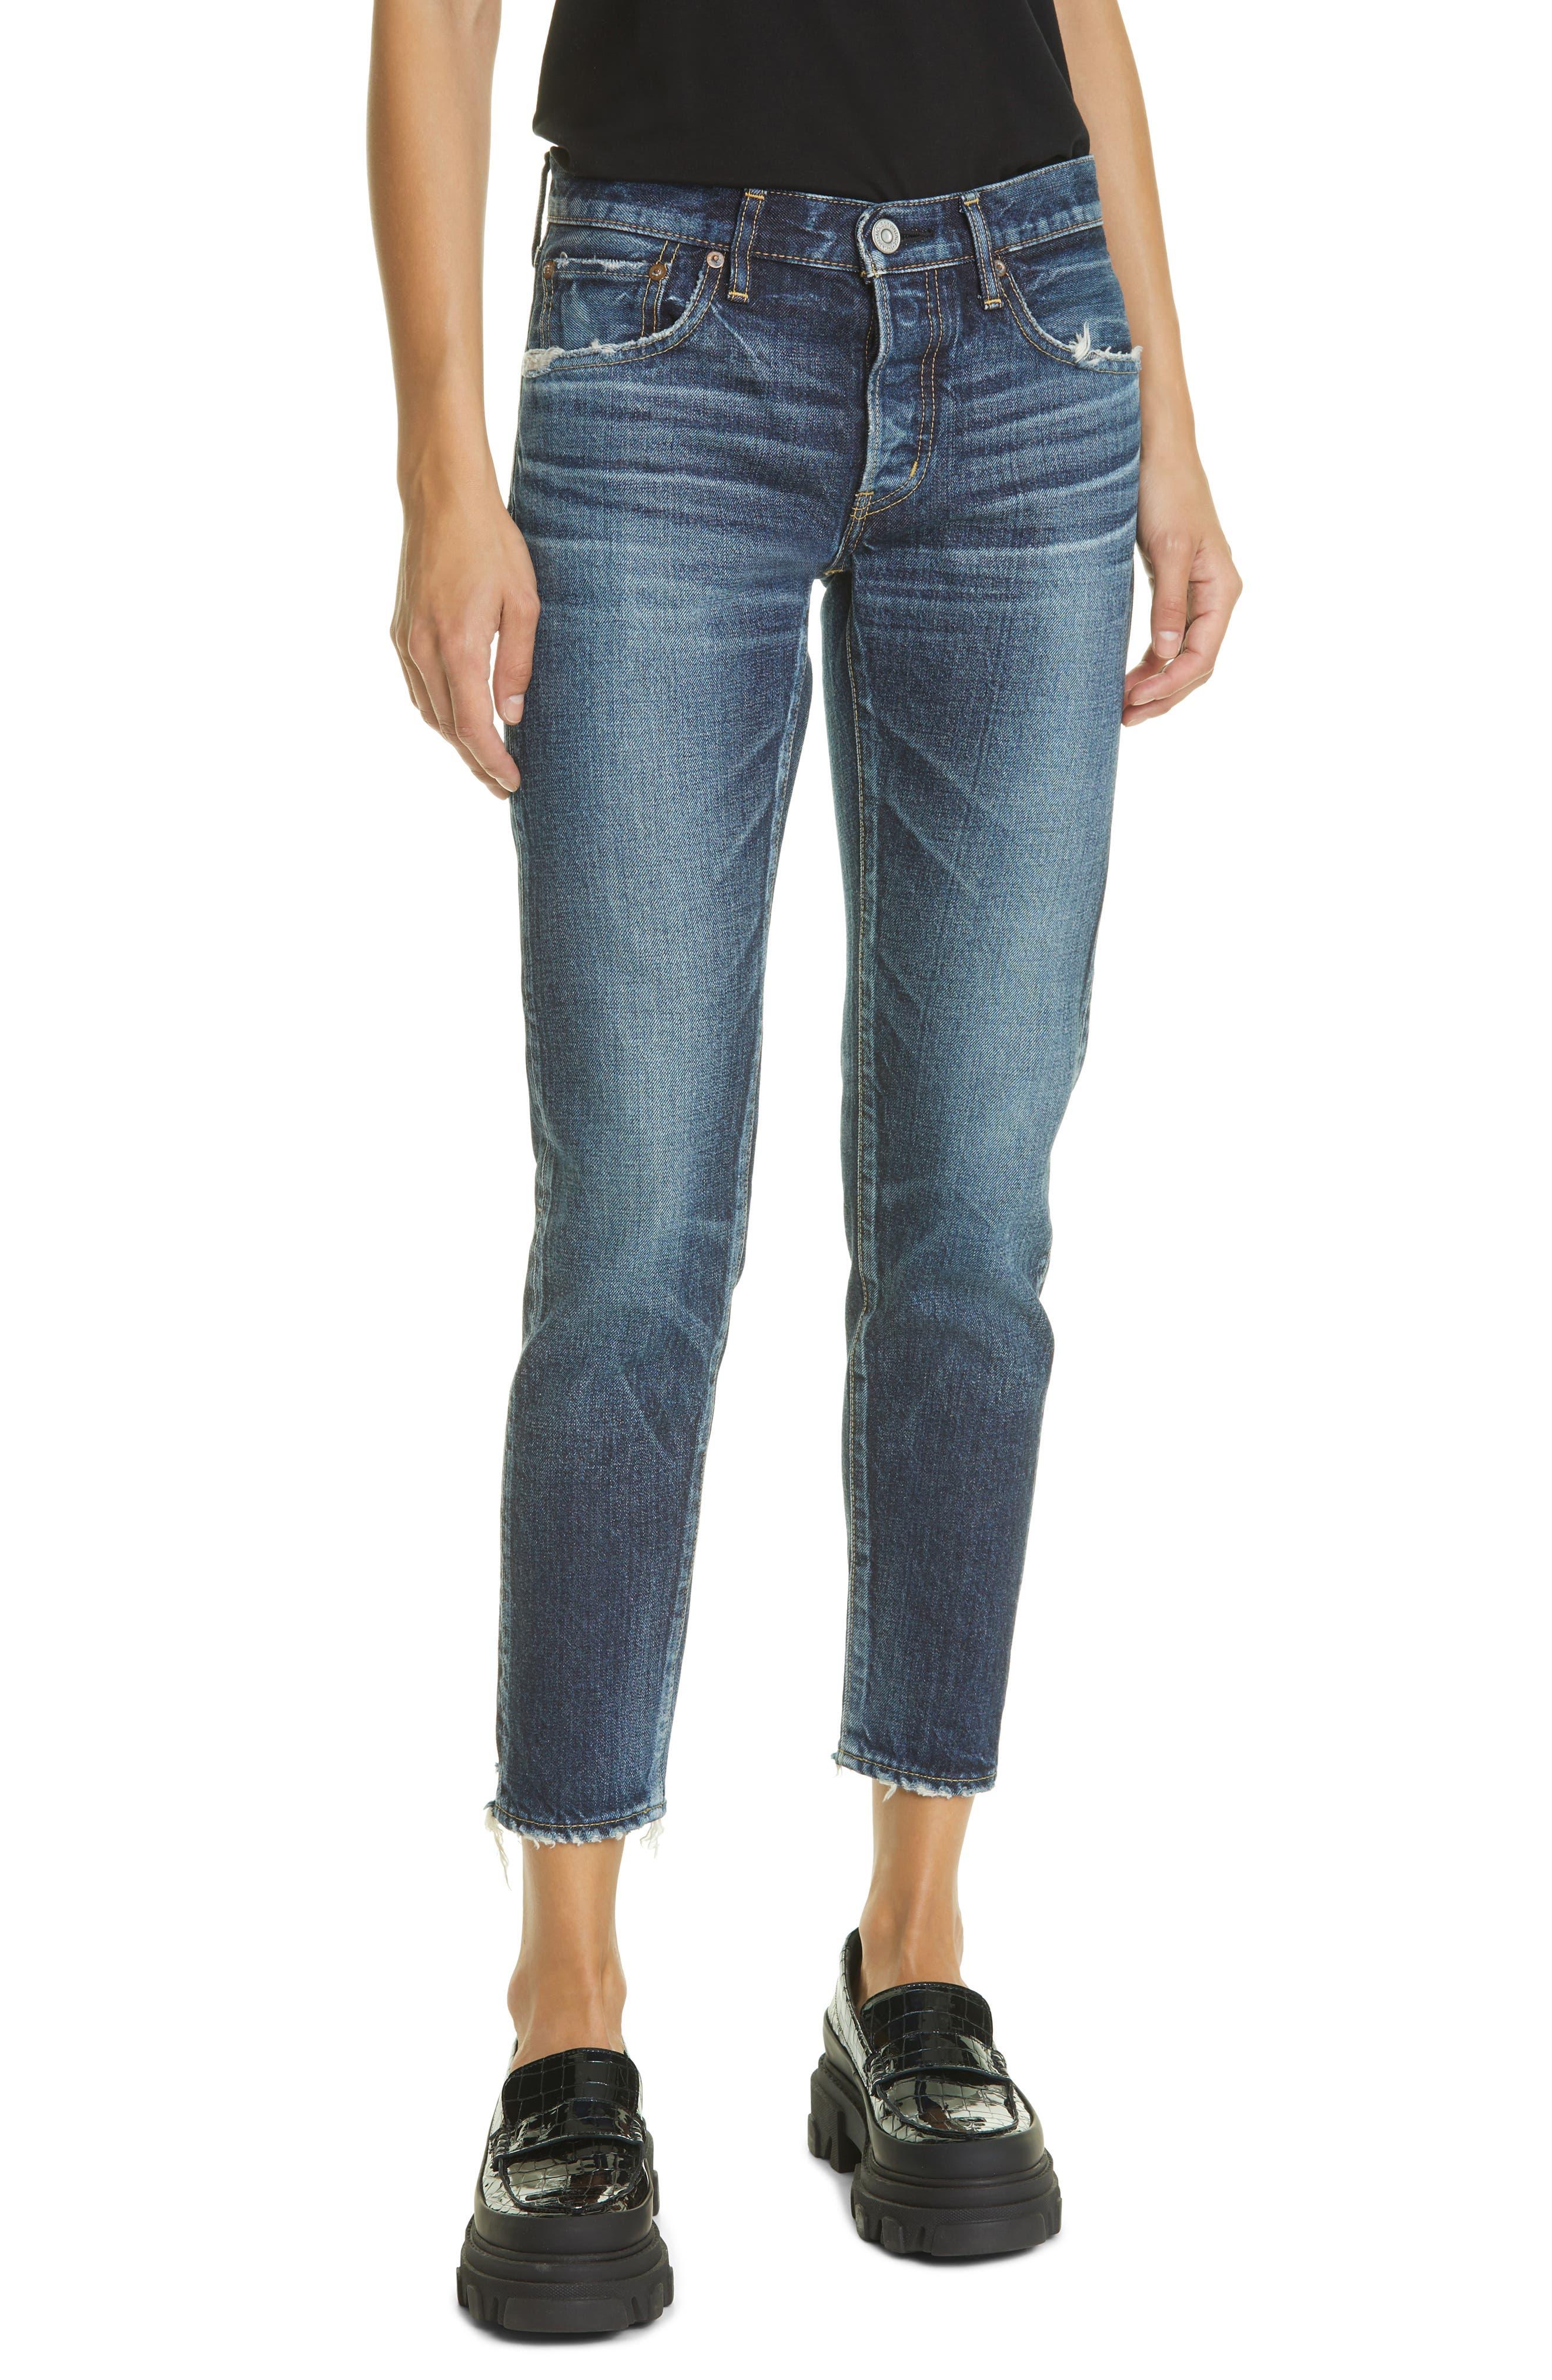 Etta Tapered Skinny Jeans